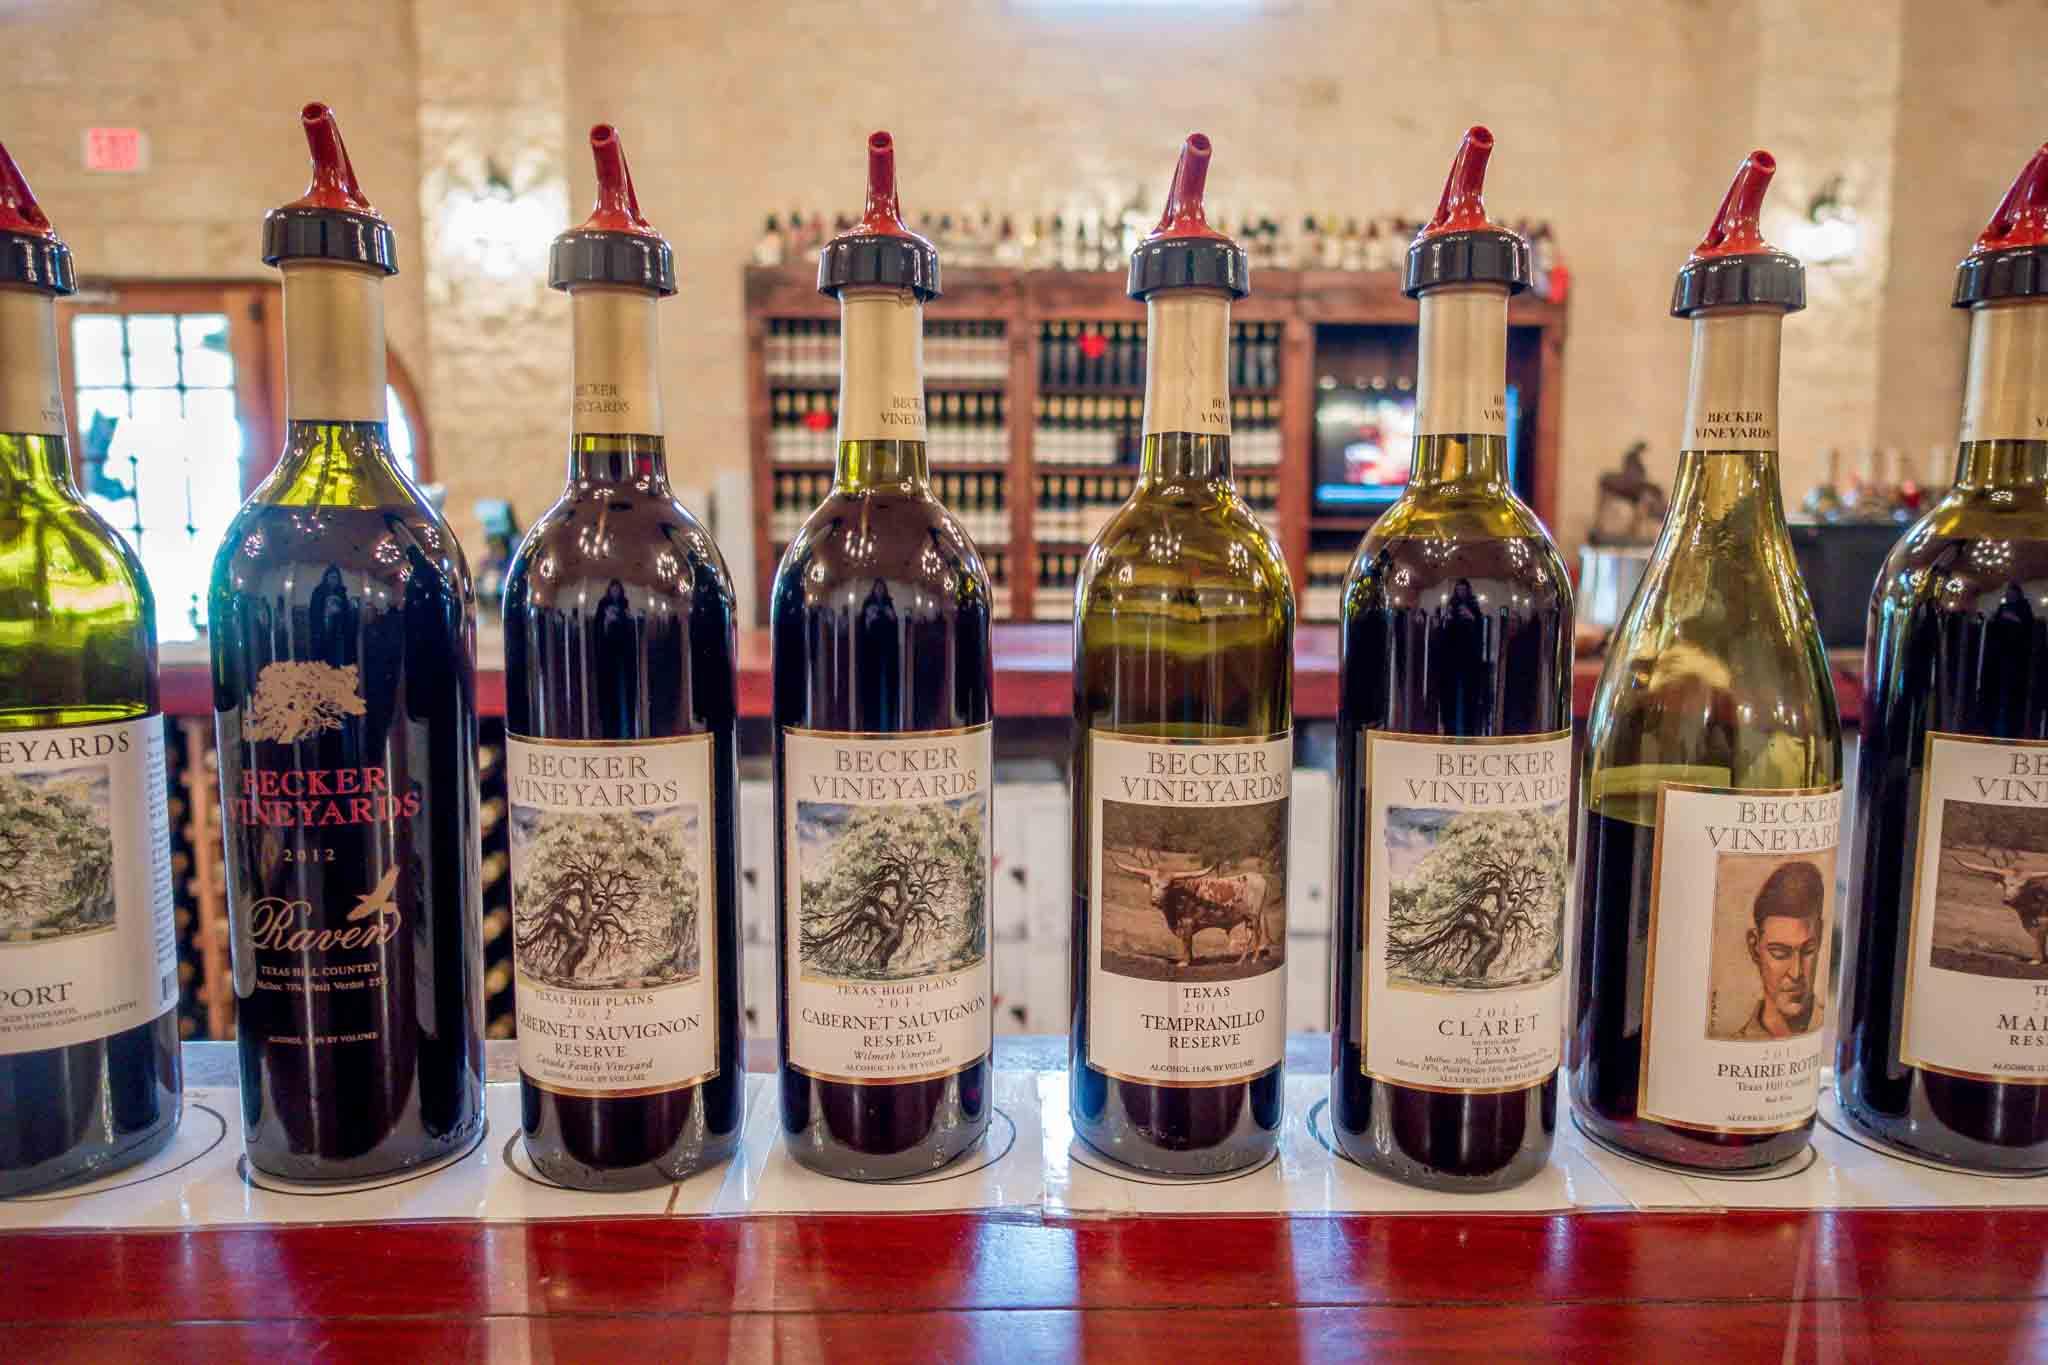 Wine bottles from Becker Vineyards, one of the largest Fredericksburg wineries